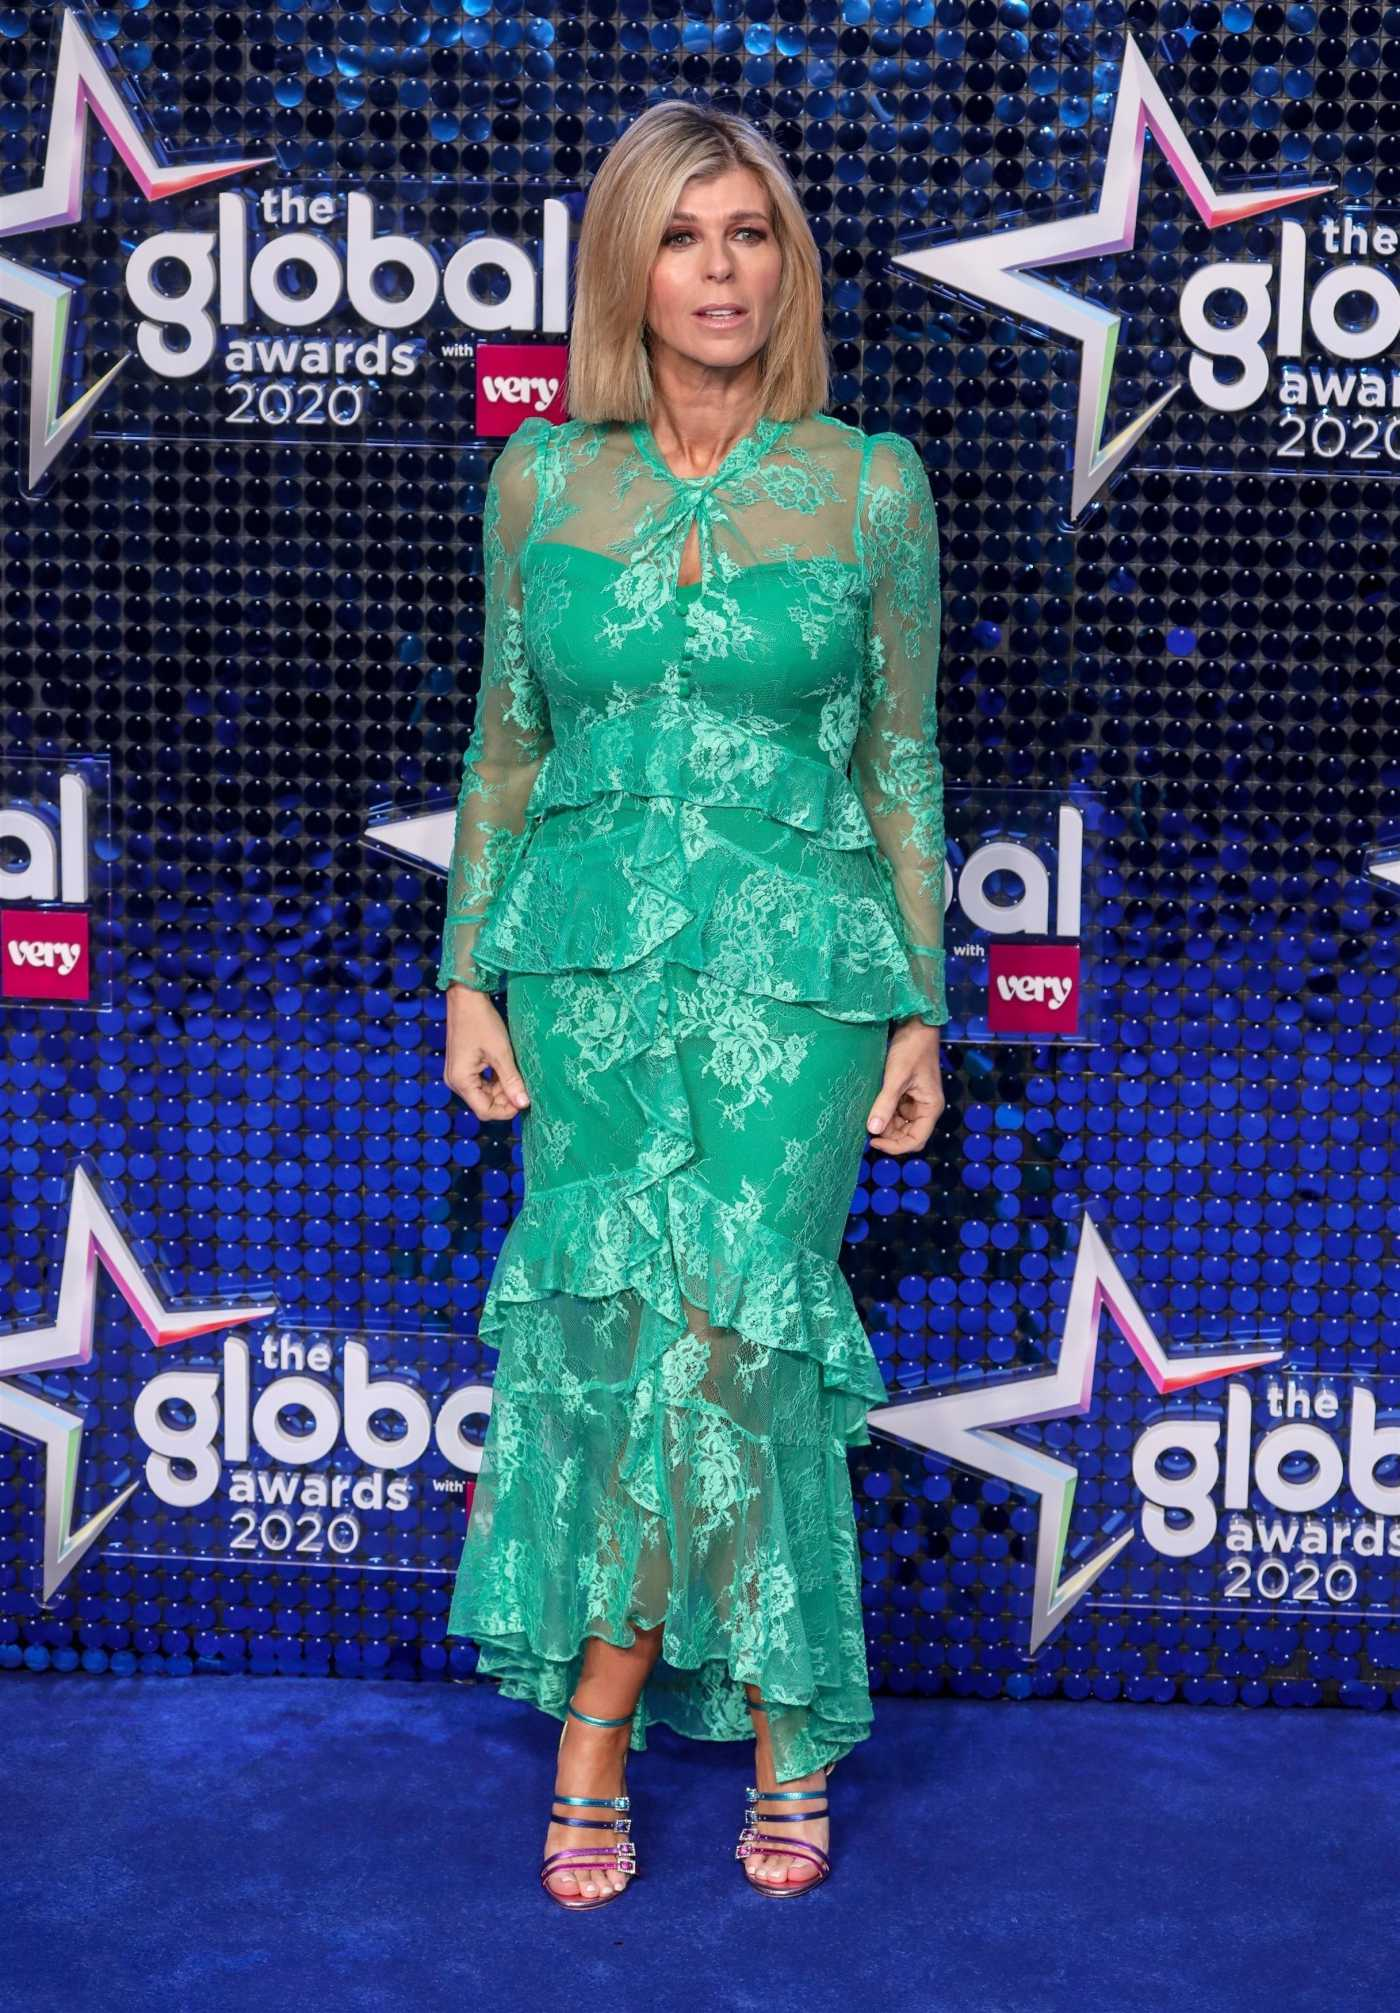 Kate Garraway Attends 2020 Global Awards in London 03/05/2020